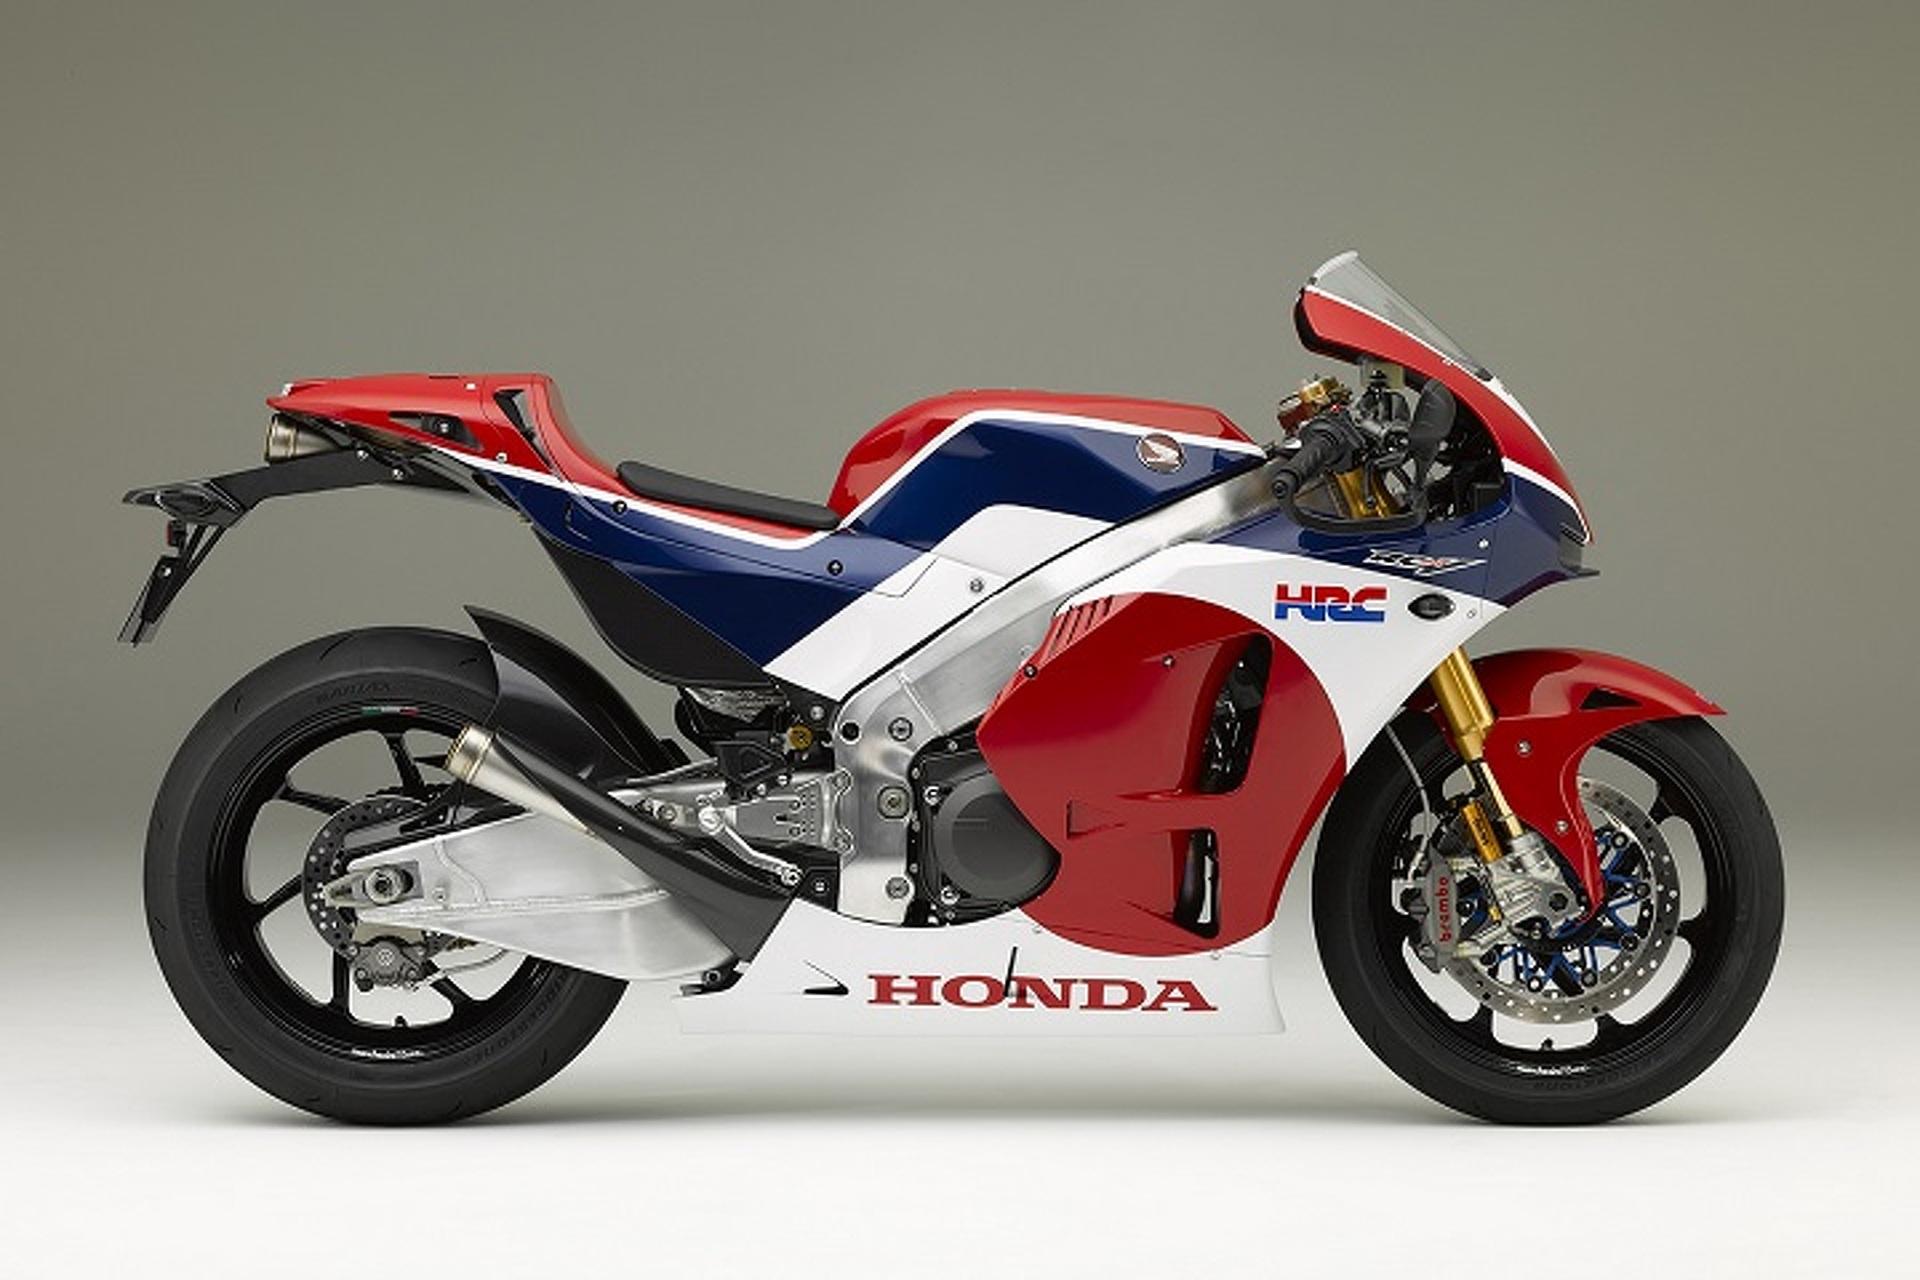 Honda's Street Legal MotoGP Bike Will Cost $184,000